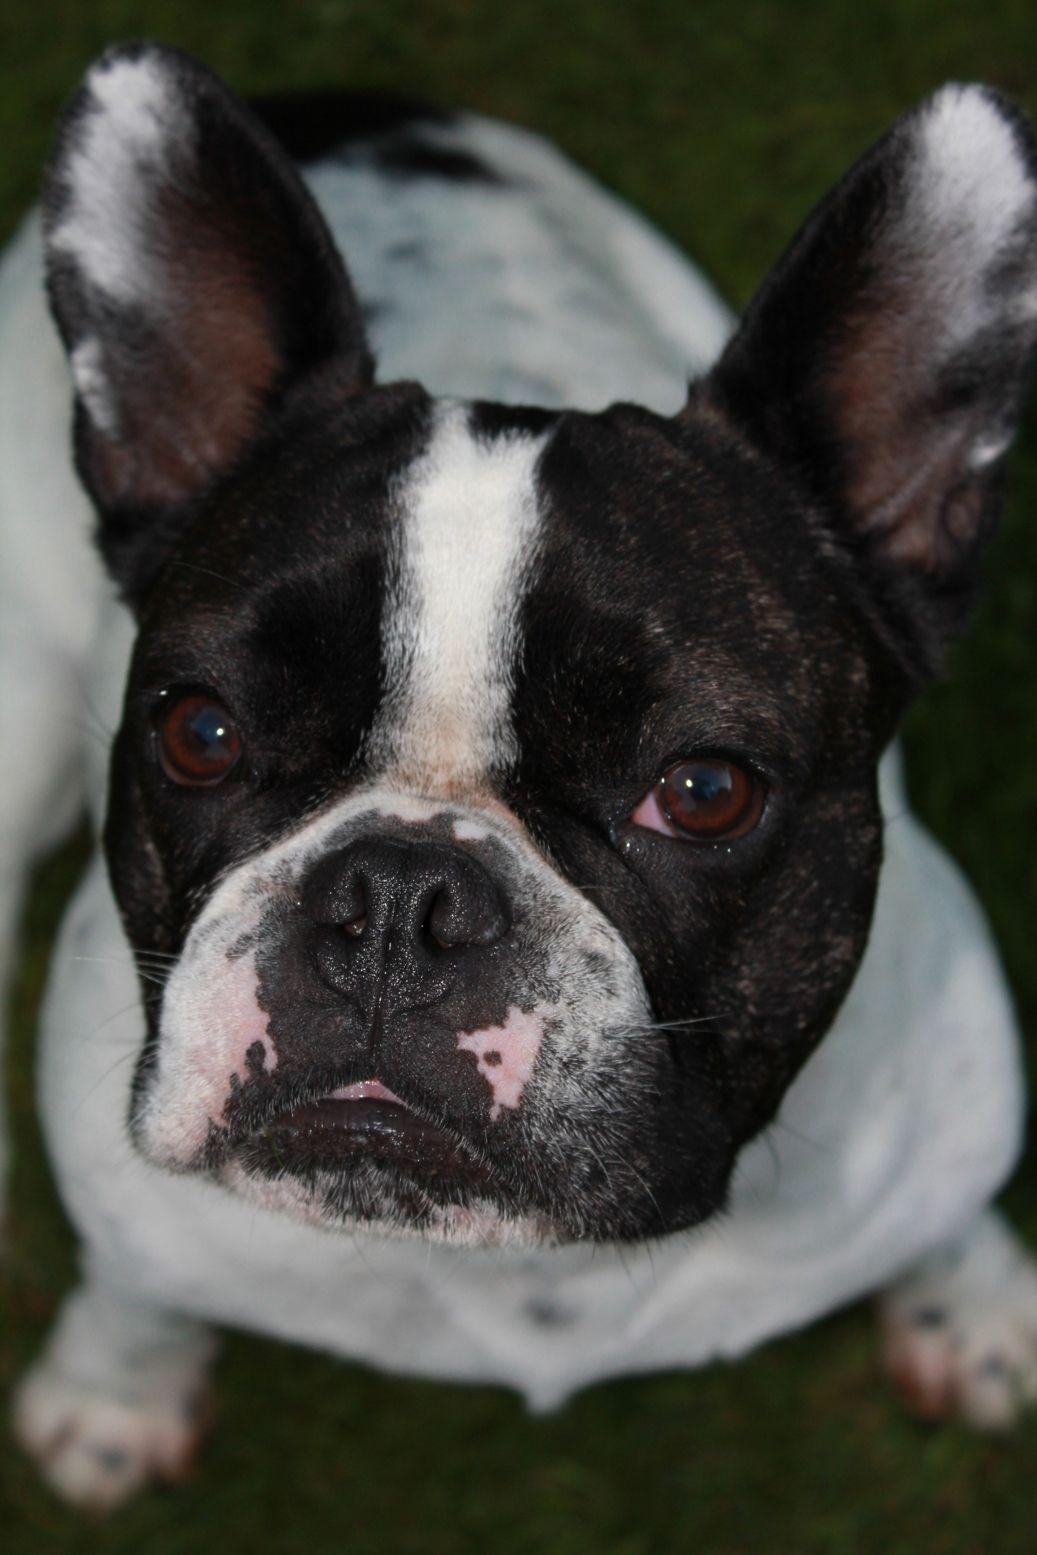 Hundezubehor Im Hundeshop Welt Des Schonen Zubehors Puppy Prince Hunde Shop Franzosische Bulldogge Bulldogge